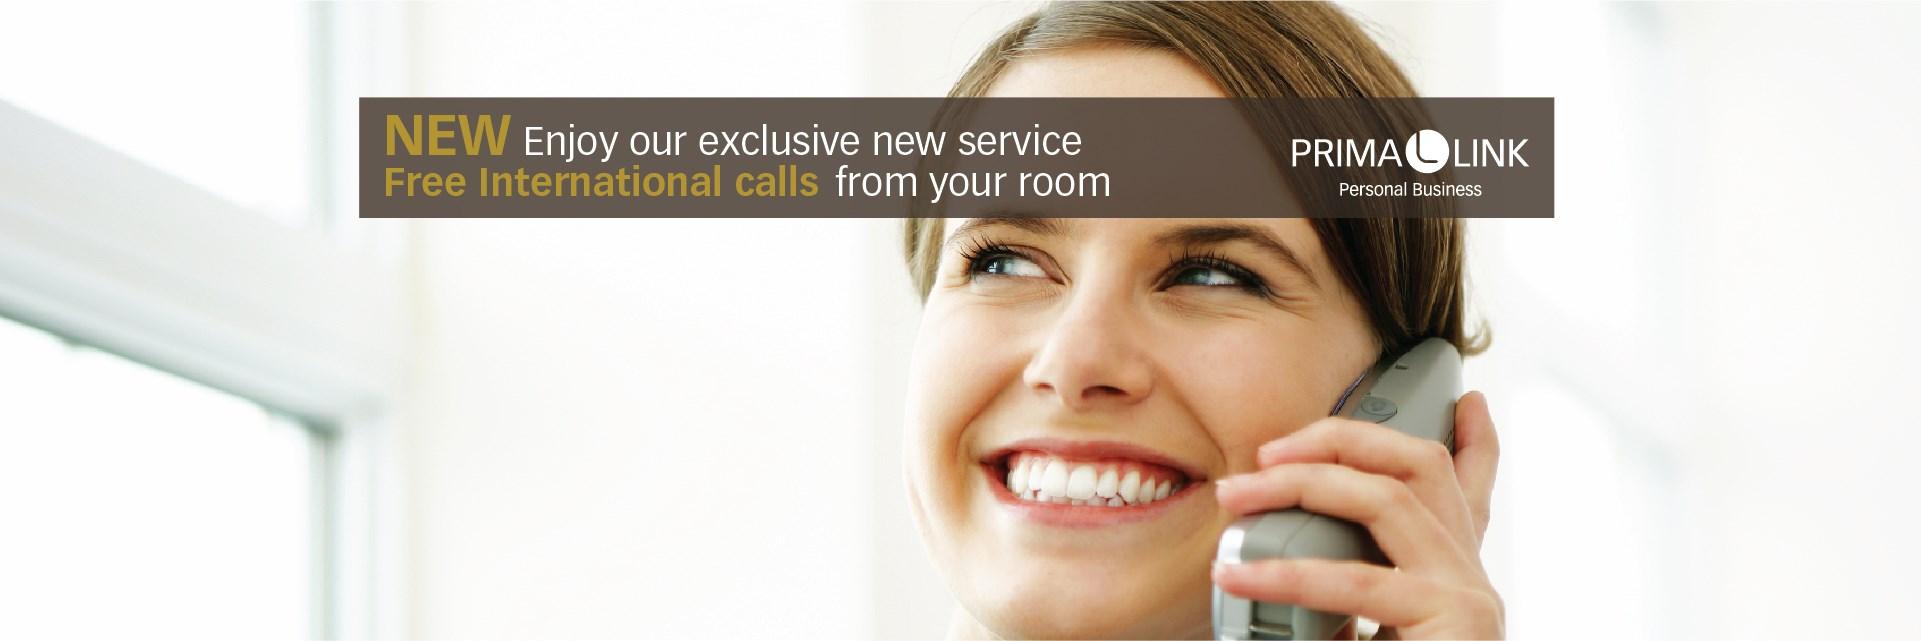 Free International Calls Prima Link